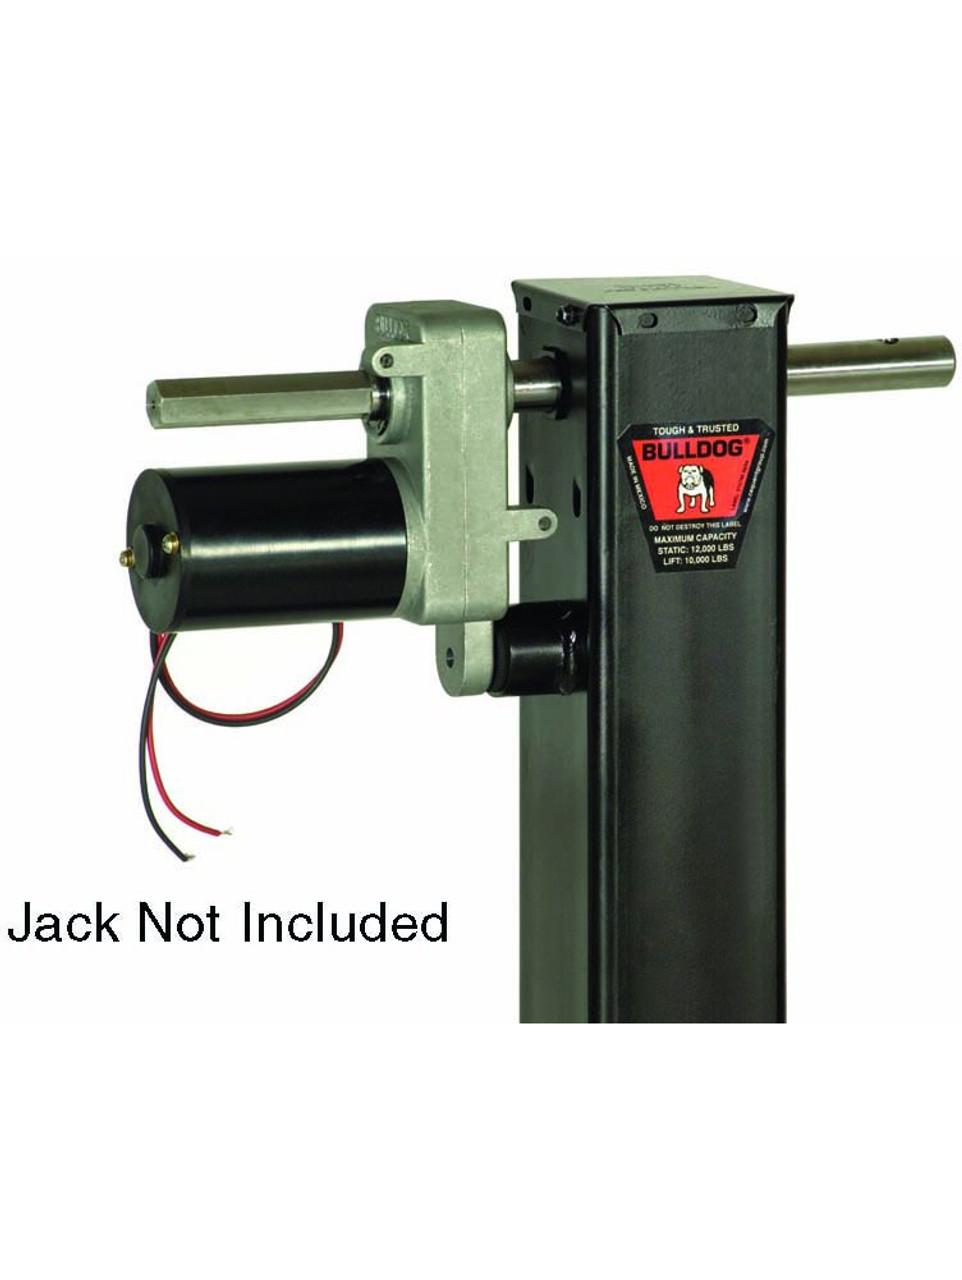 EMK12K --- BULLDOG Aftermarket Electric Motor Kit for BULLDOG Jacks